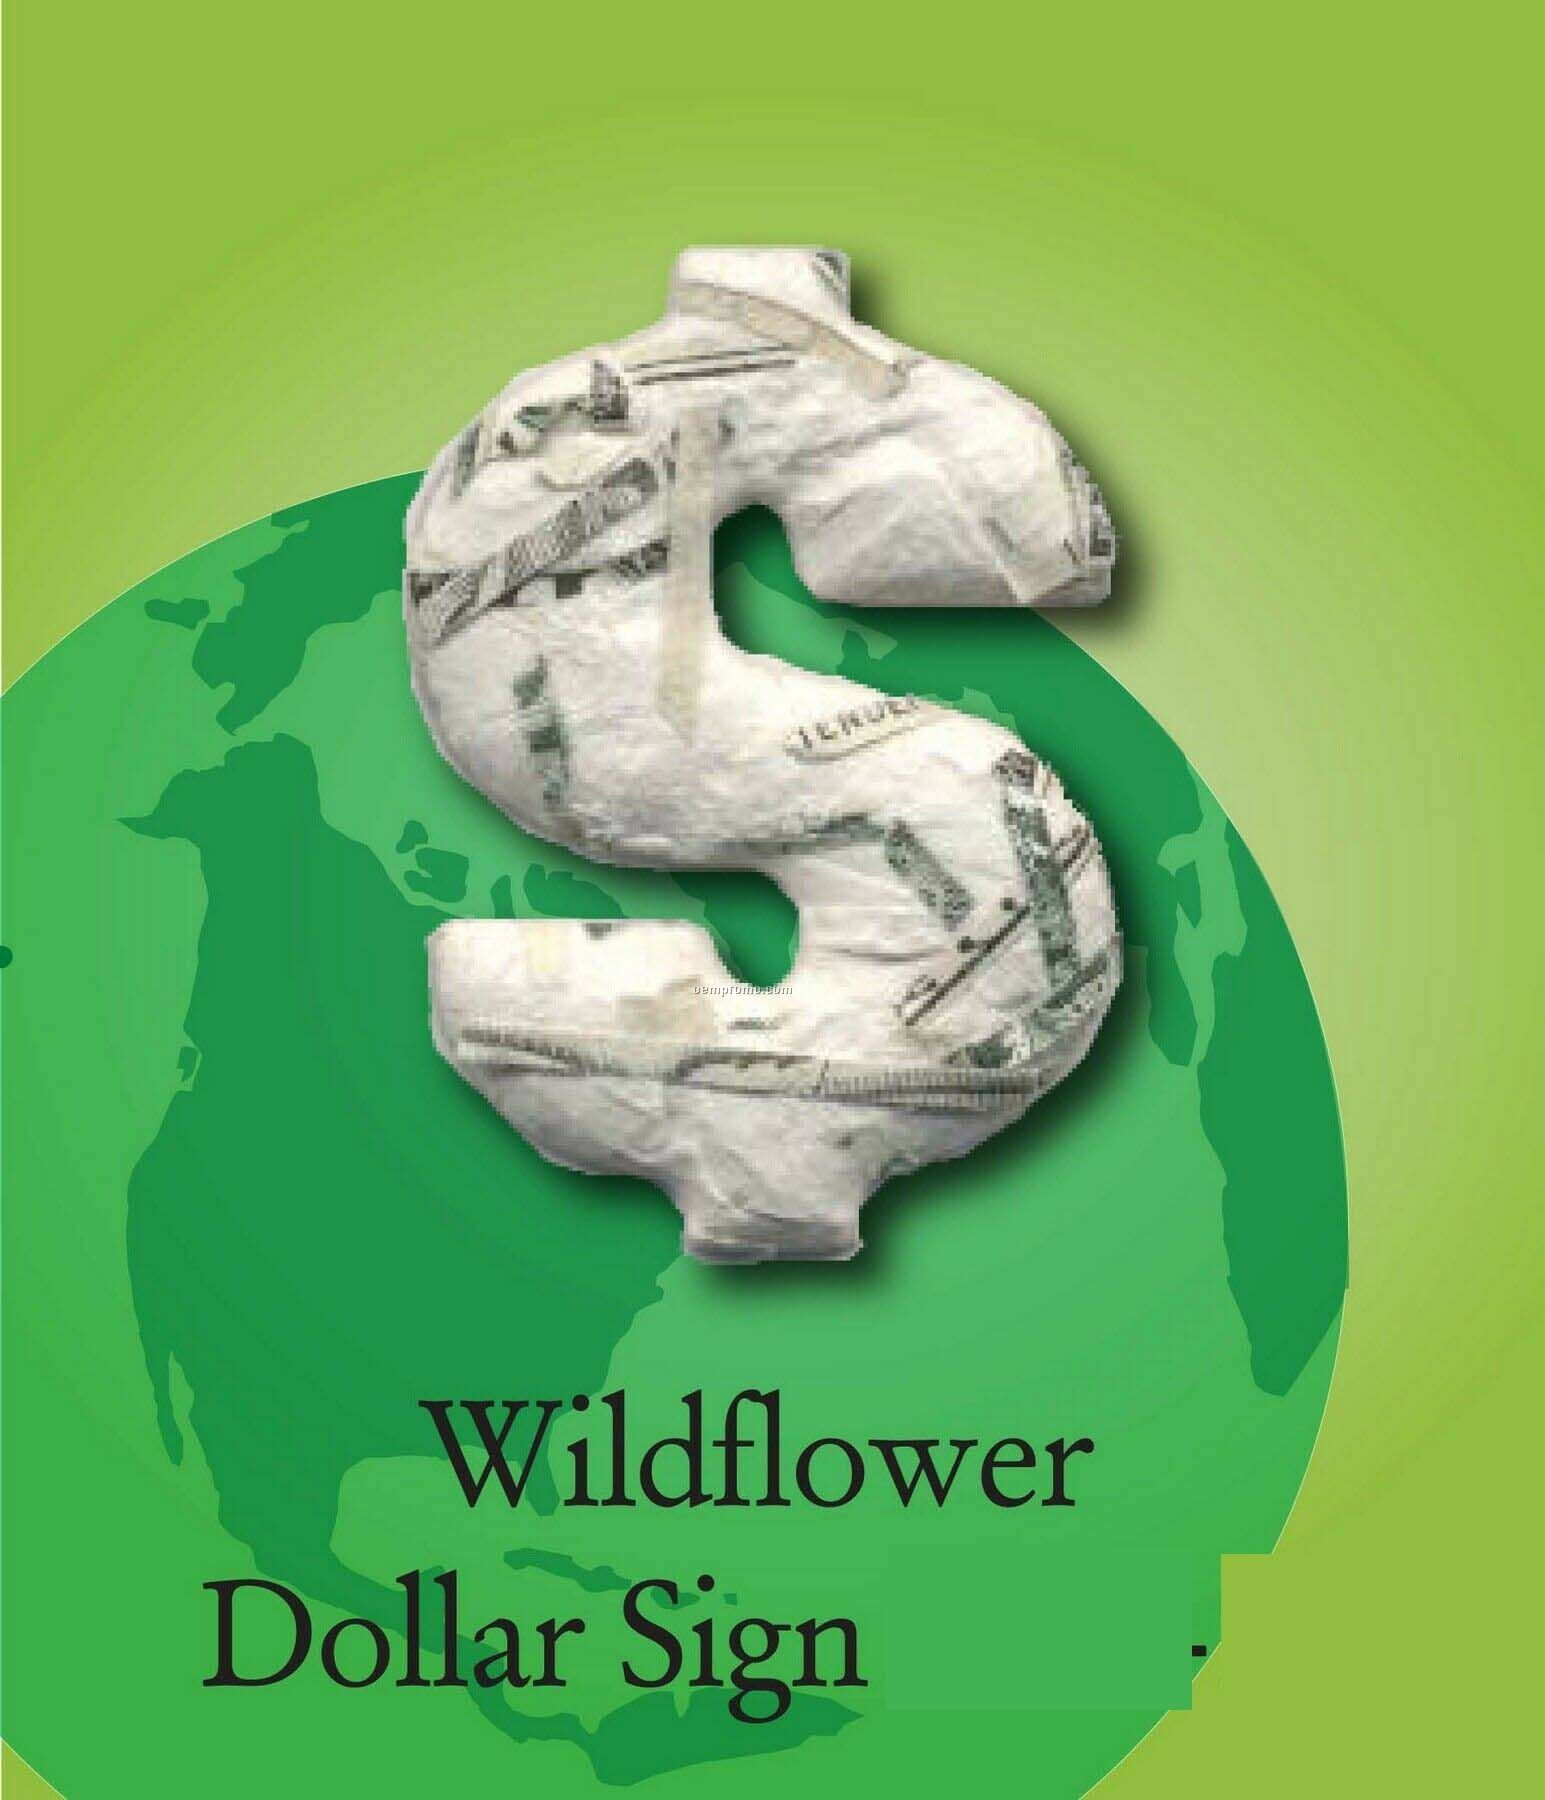 Wildflower Dollar Sign Handmade Seed Plantable Mini